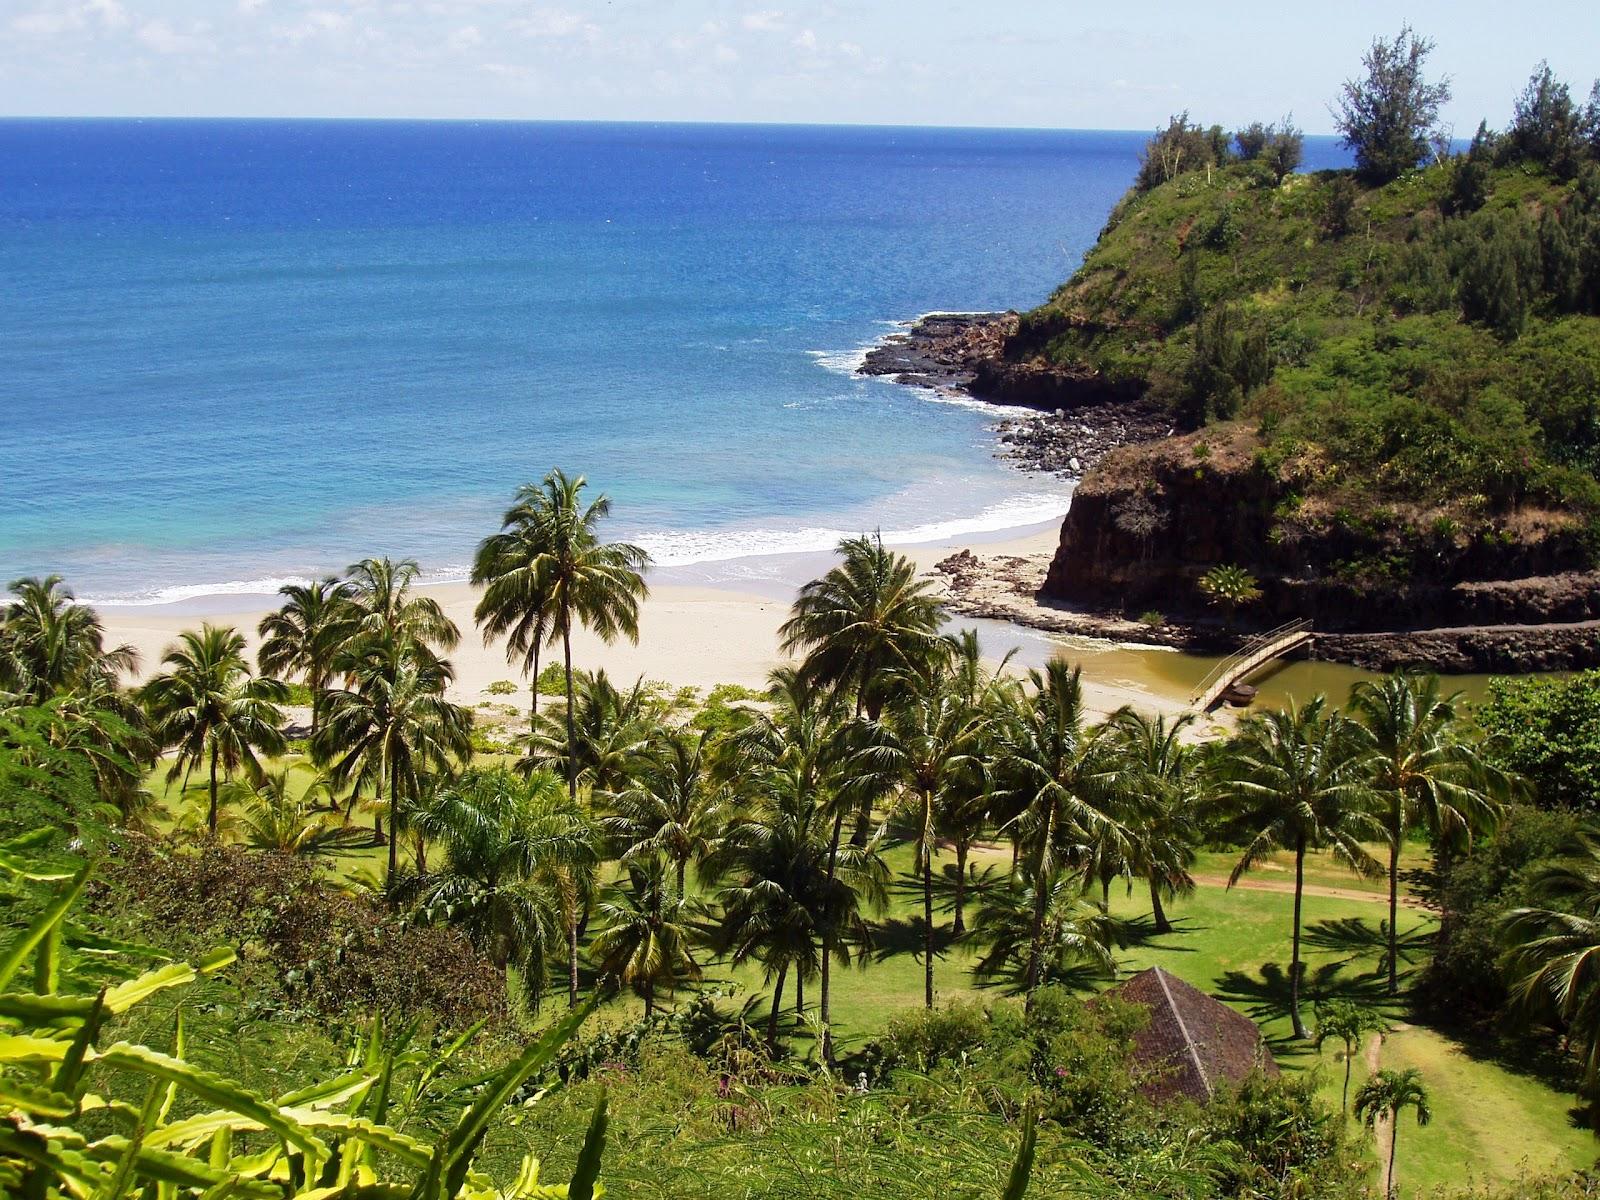 Ho okuleana national tropical botanical garden ntbg - National tropical botanical garden ...